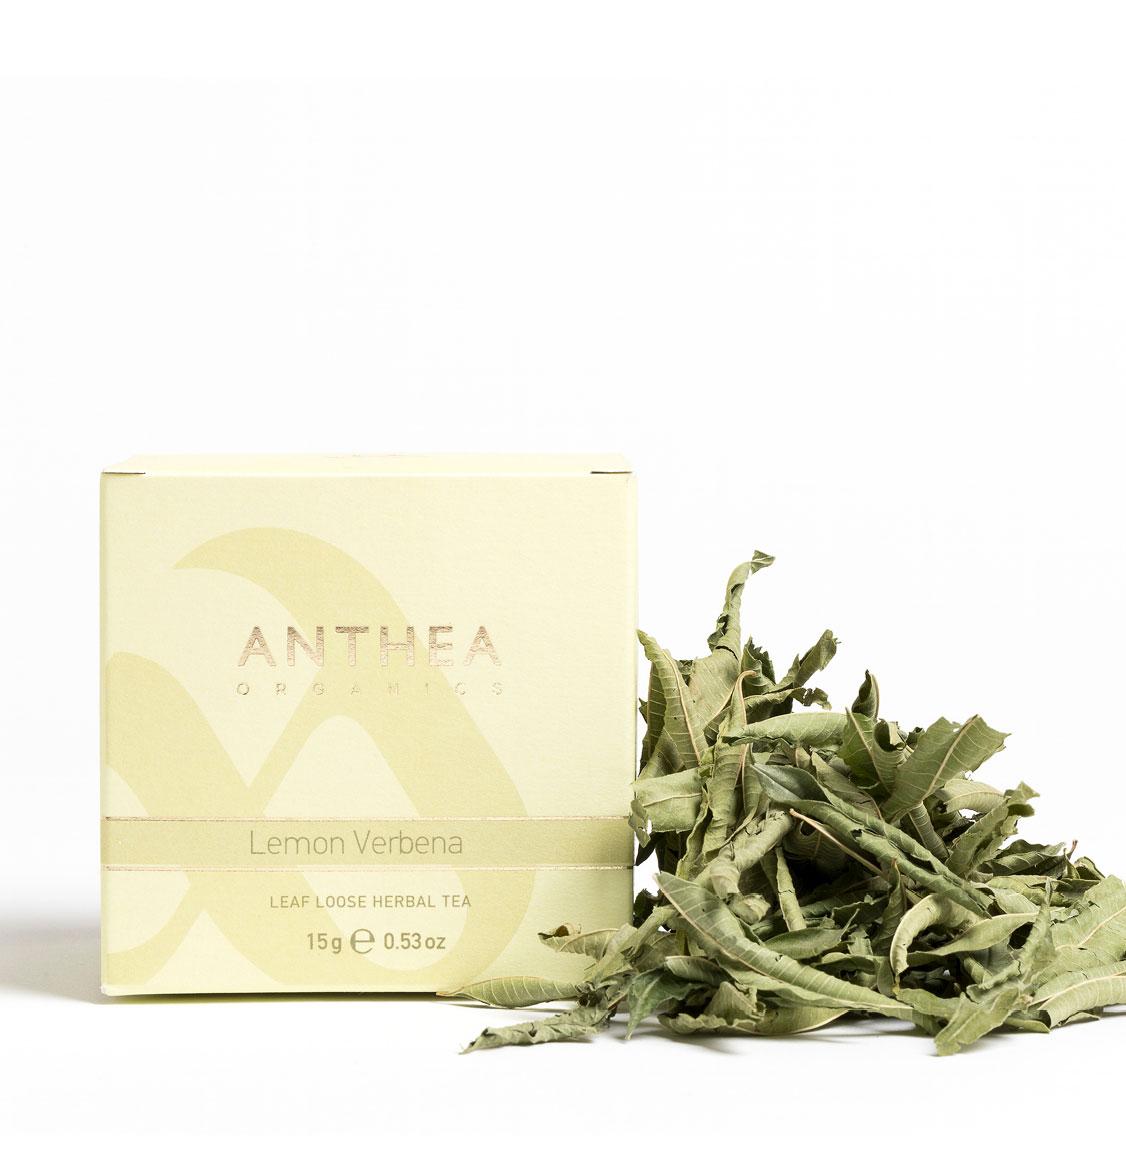 Anthea Organics Βιολογική Λουίζα Leaf Loose Lemon Verbena 15g